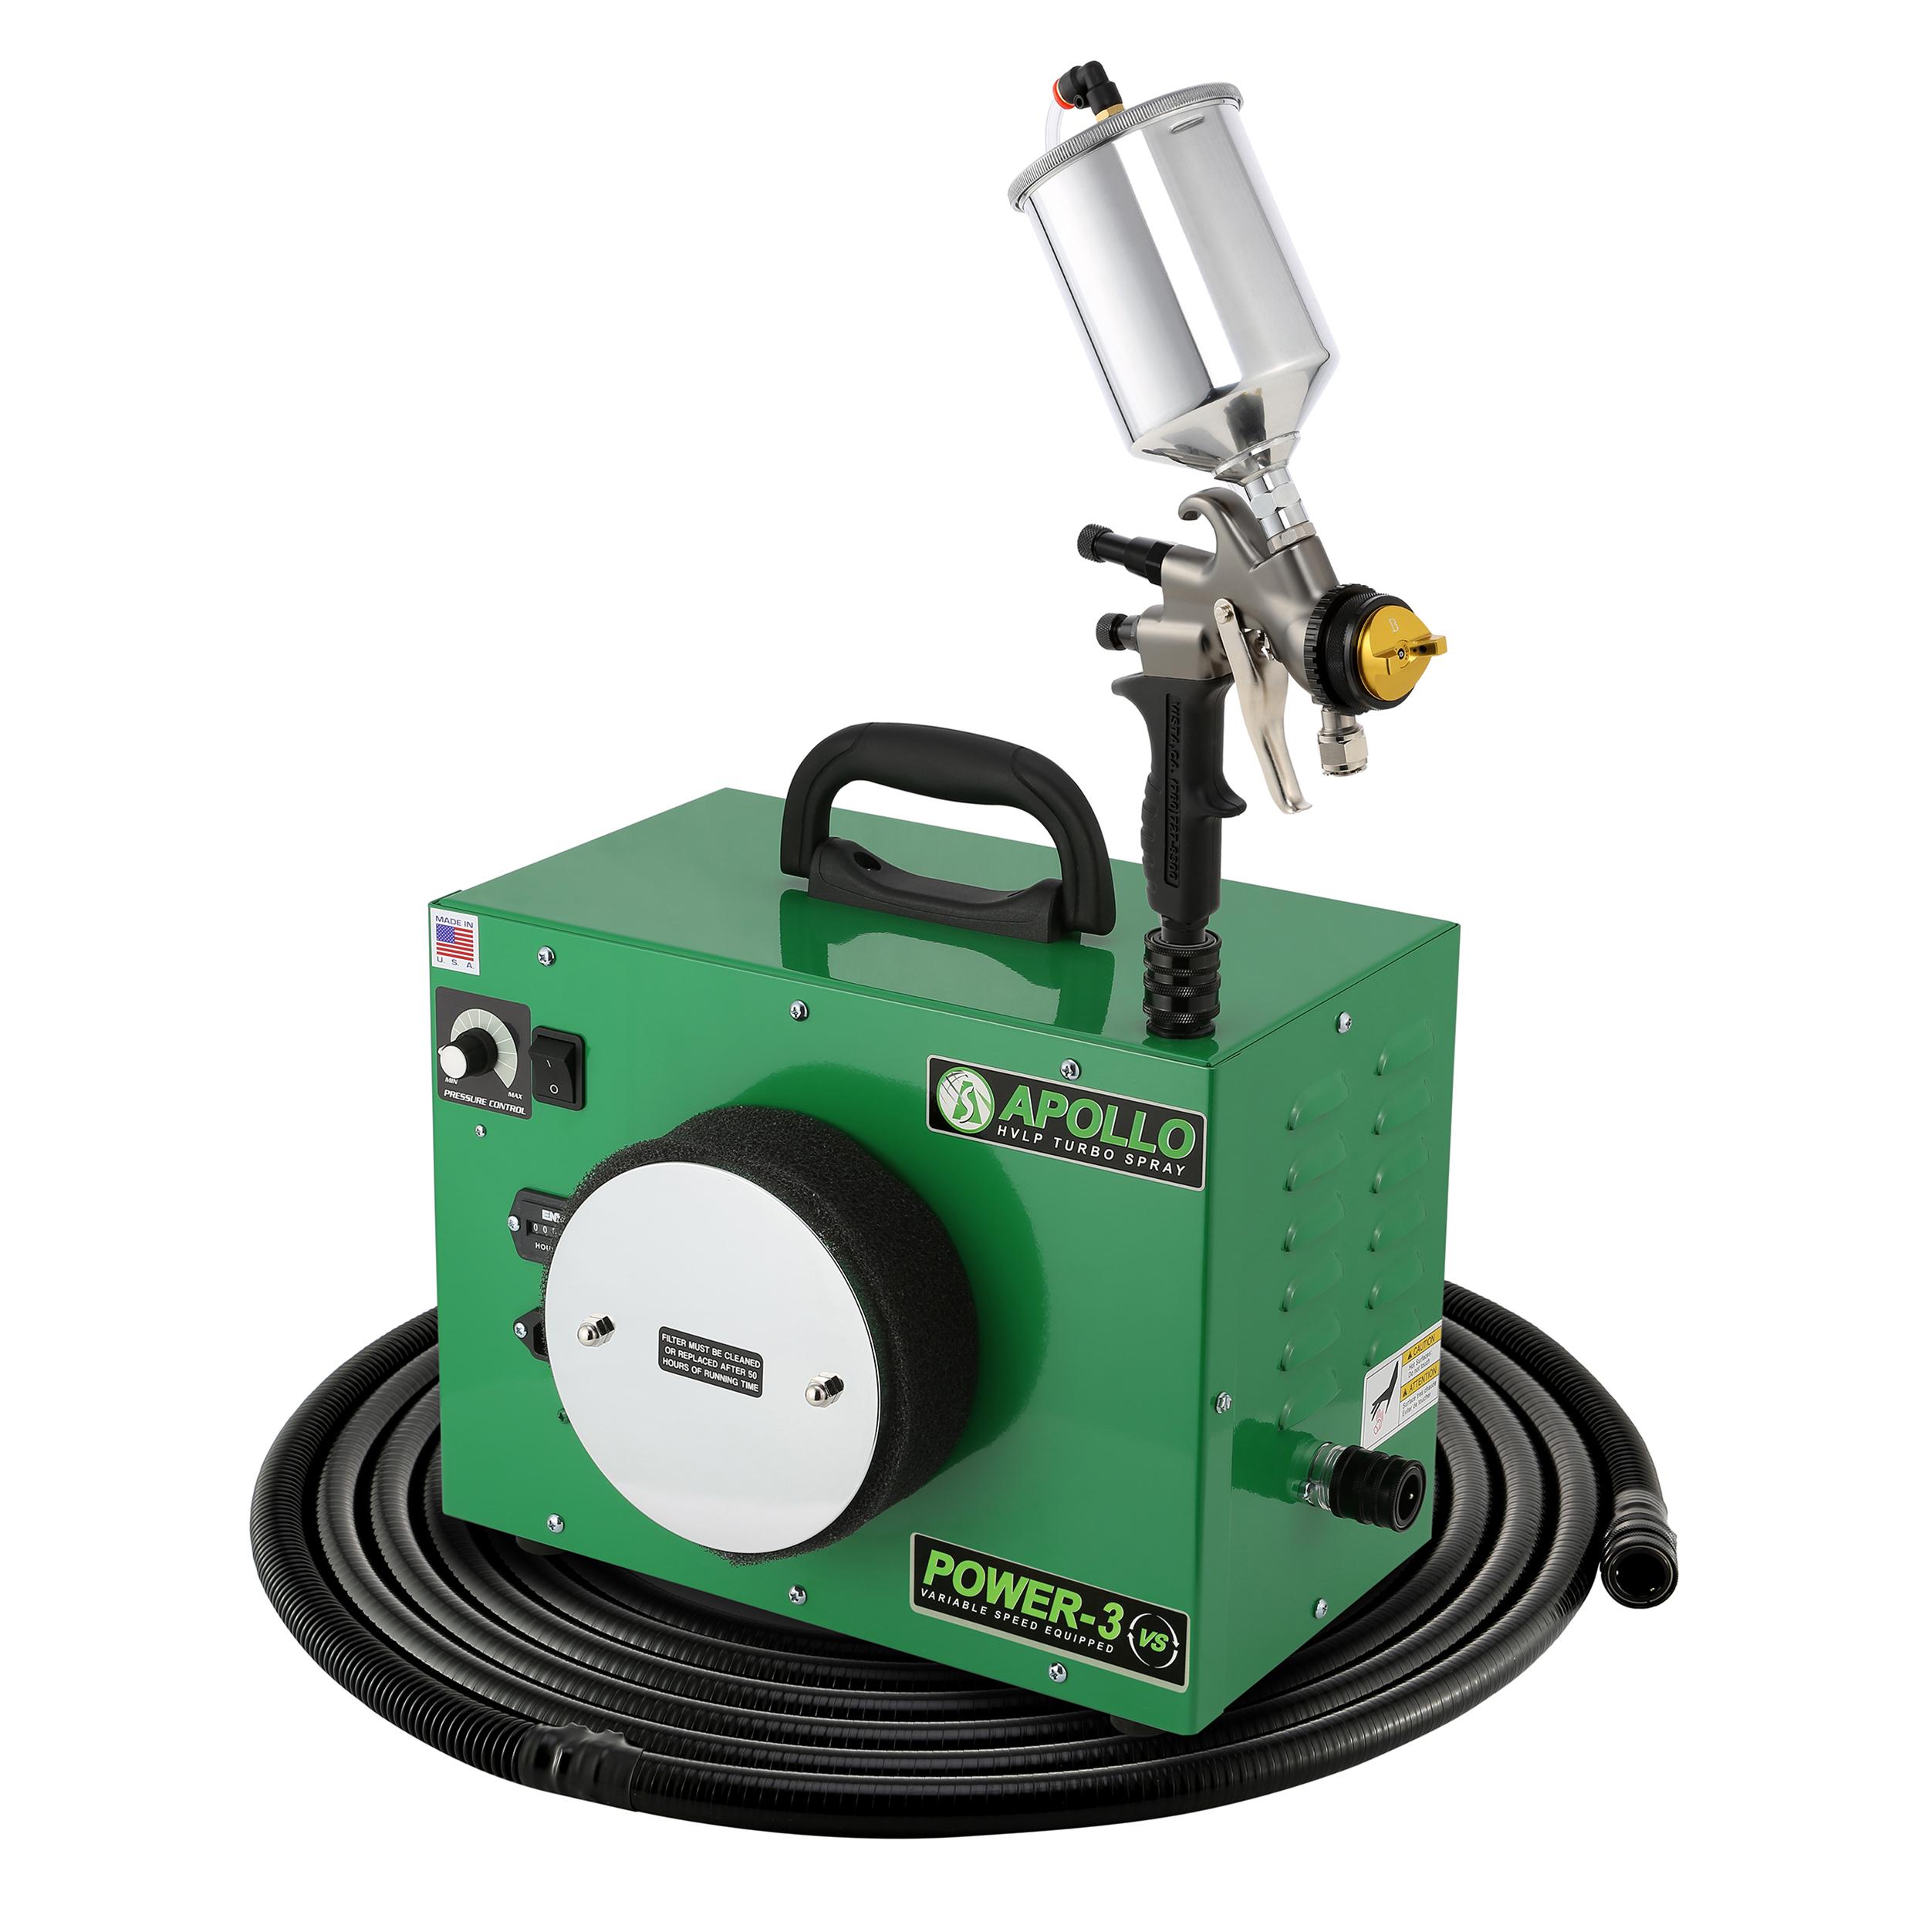 Power-3 VS HVLP Spray System with Gravity Feed Spray Gun